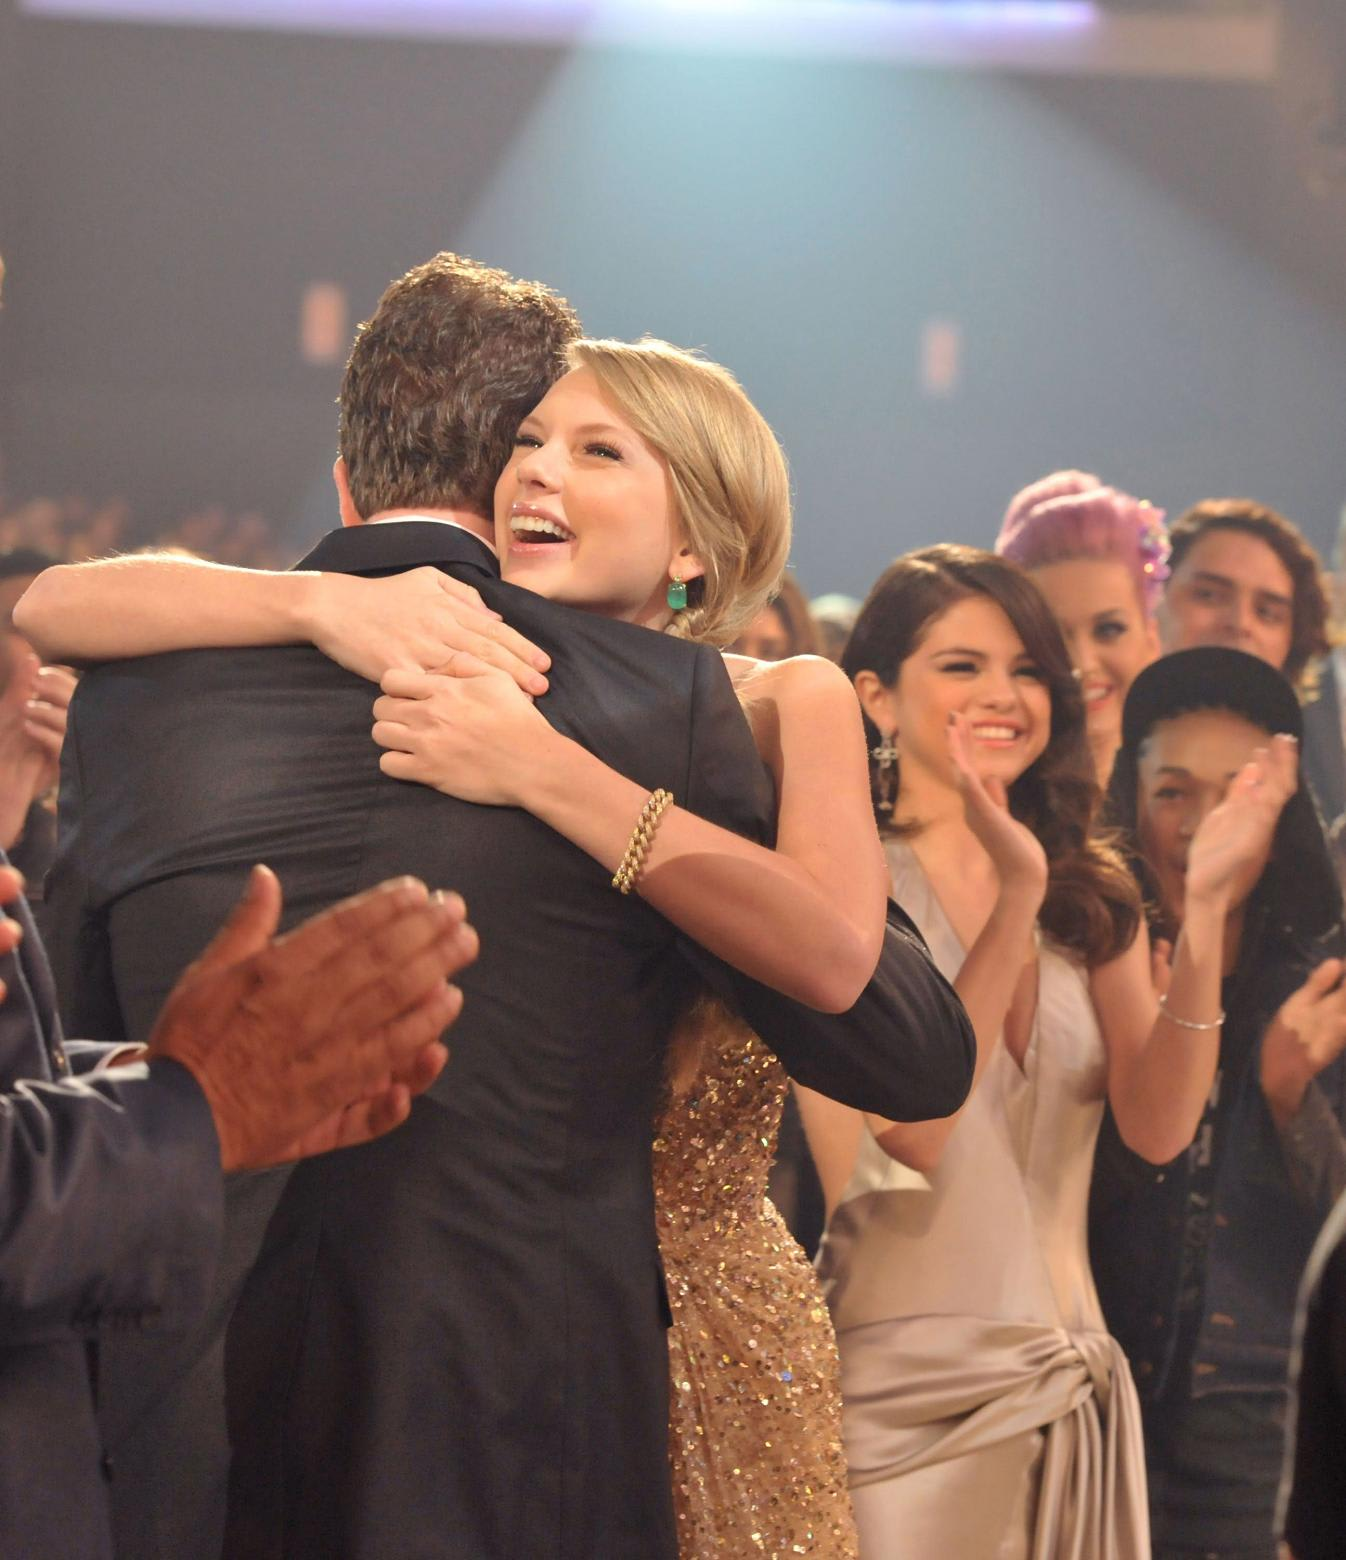 To Da Loos November 2011: 2011 American Music Awards 20 Nov 2011 (2